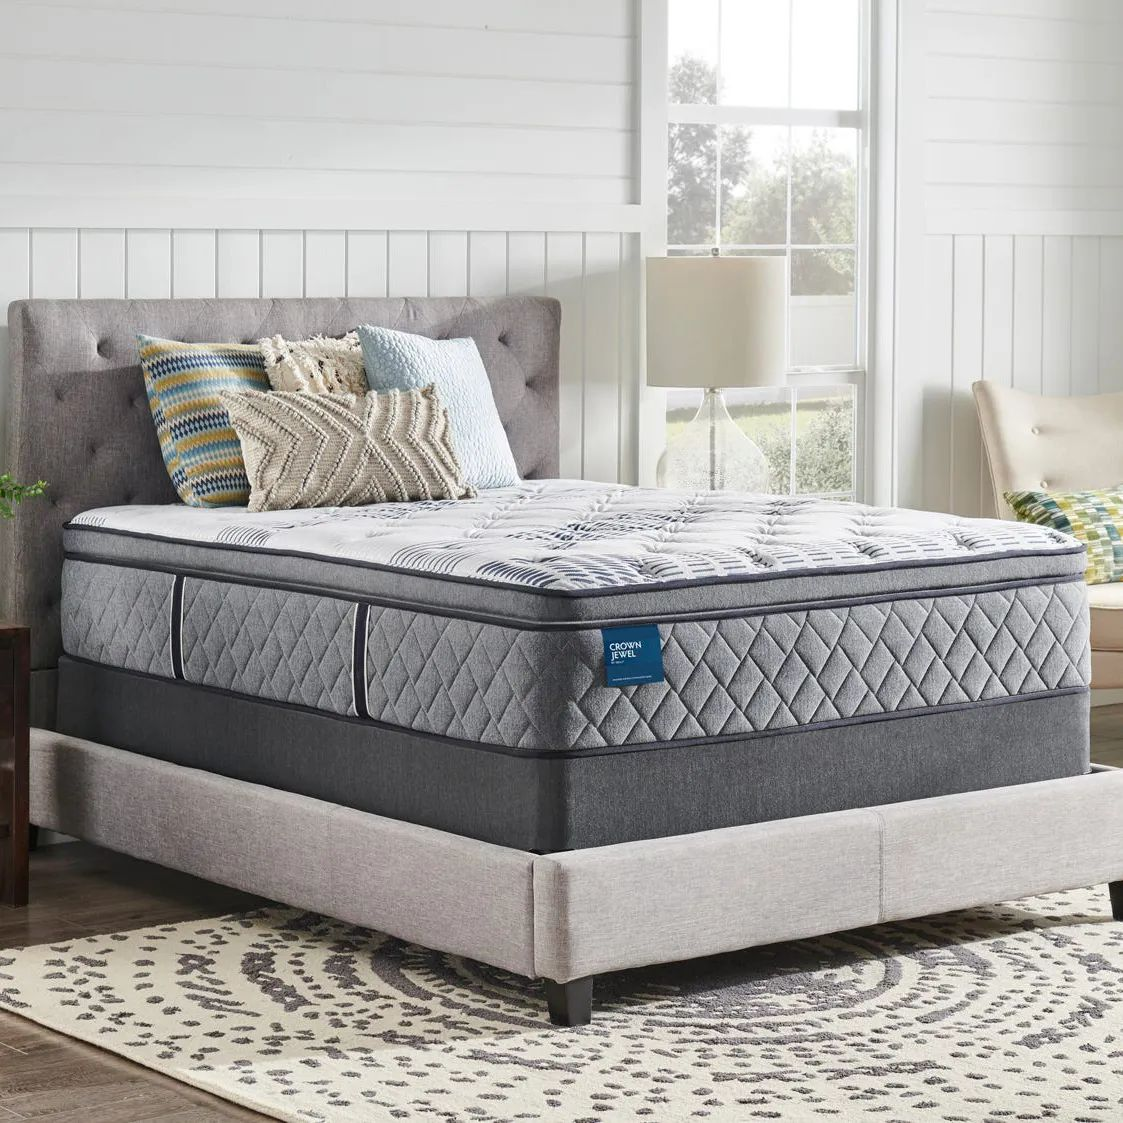 king sealy crown jewel performance roseway plush pillow top 15 inch mattress